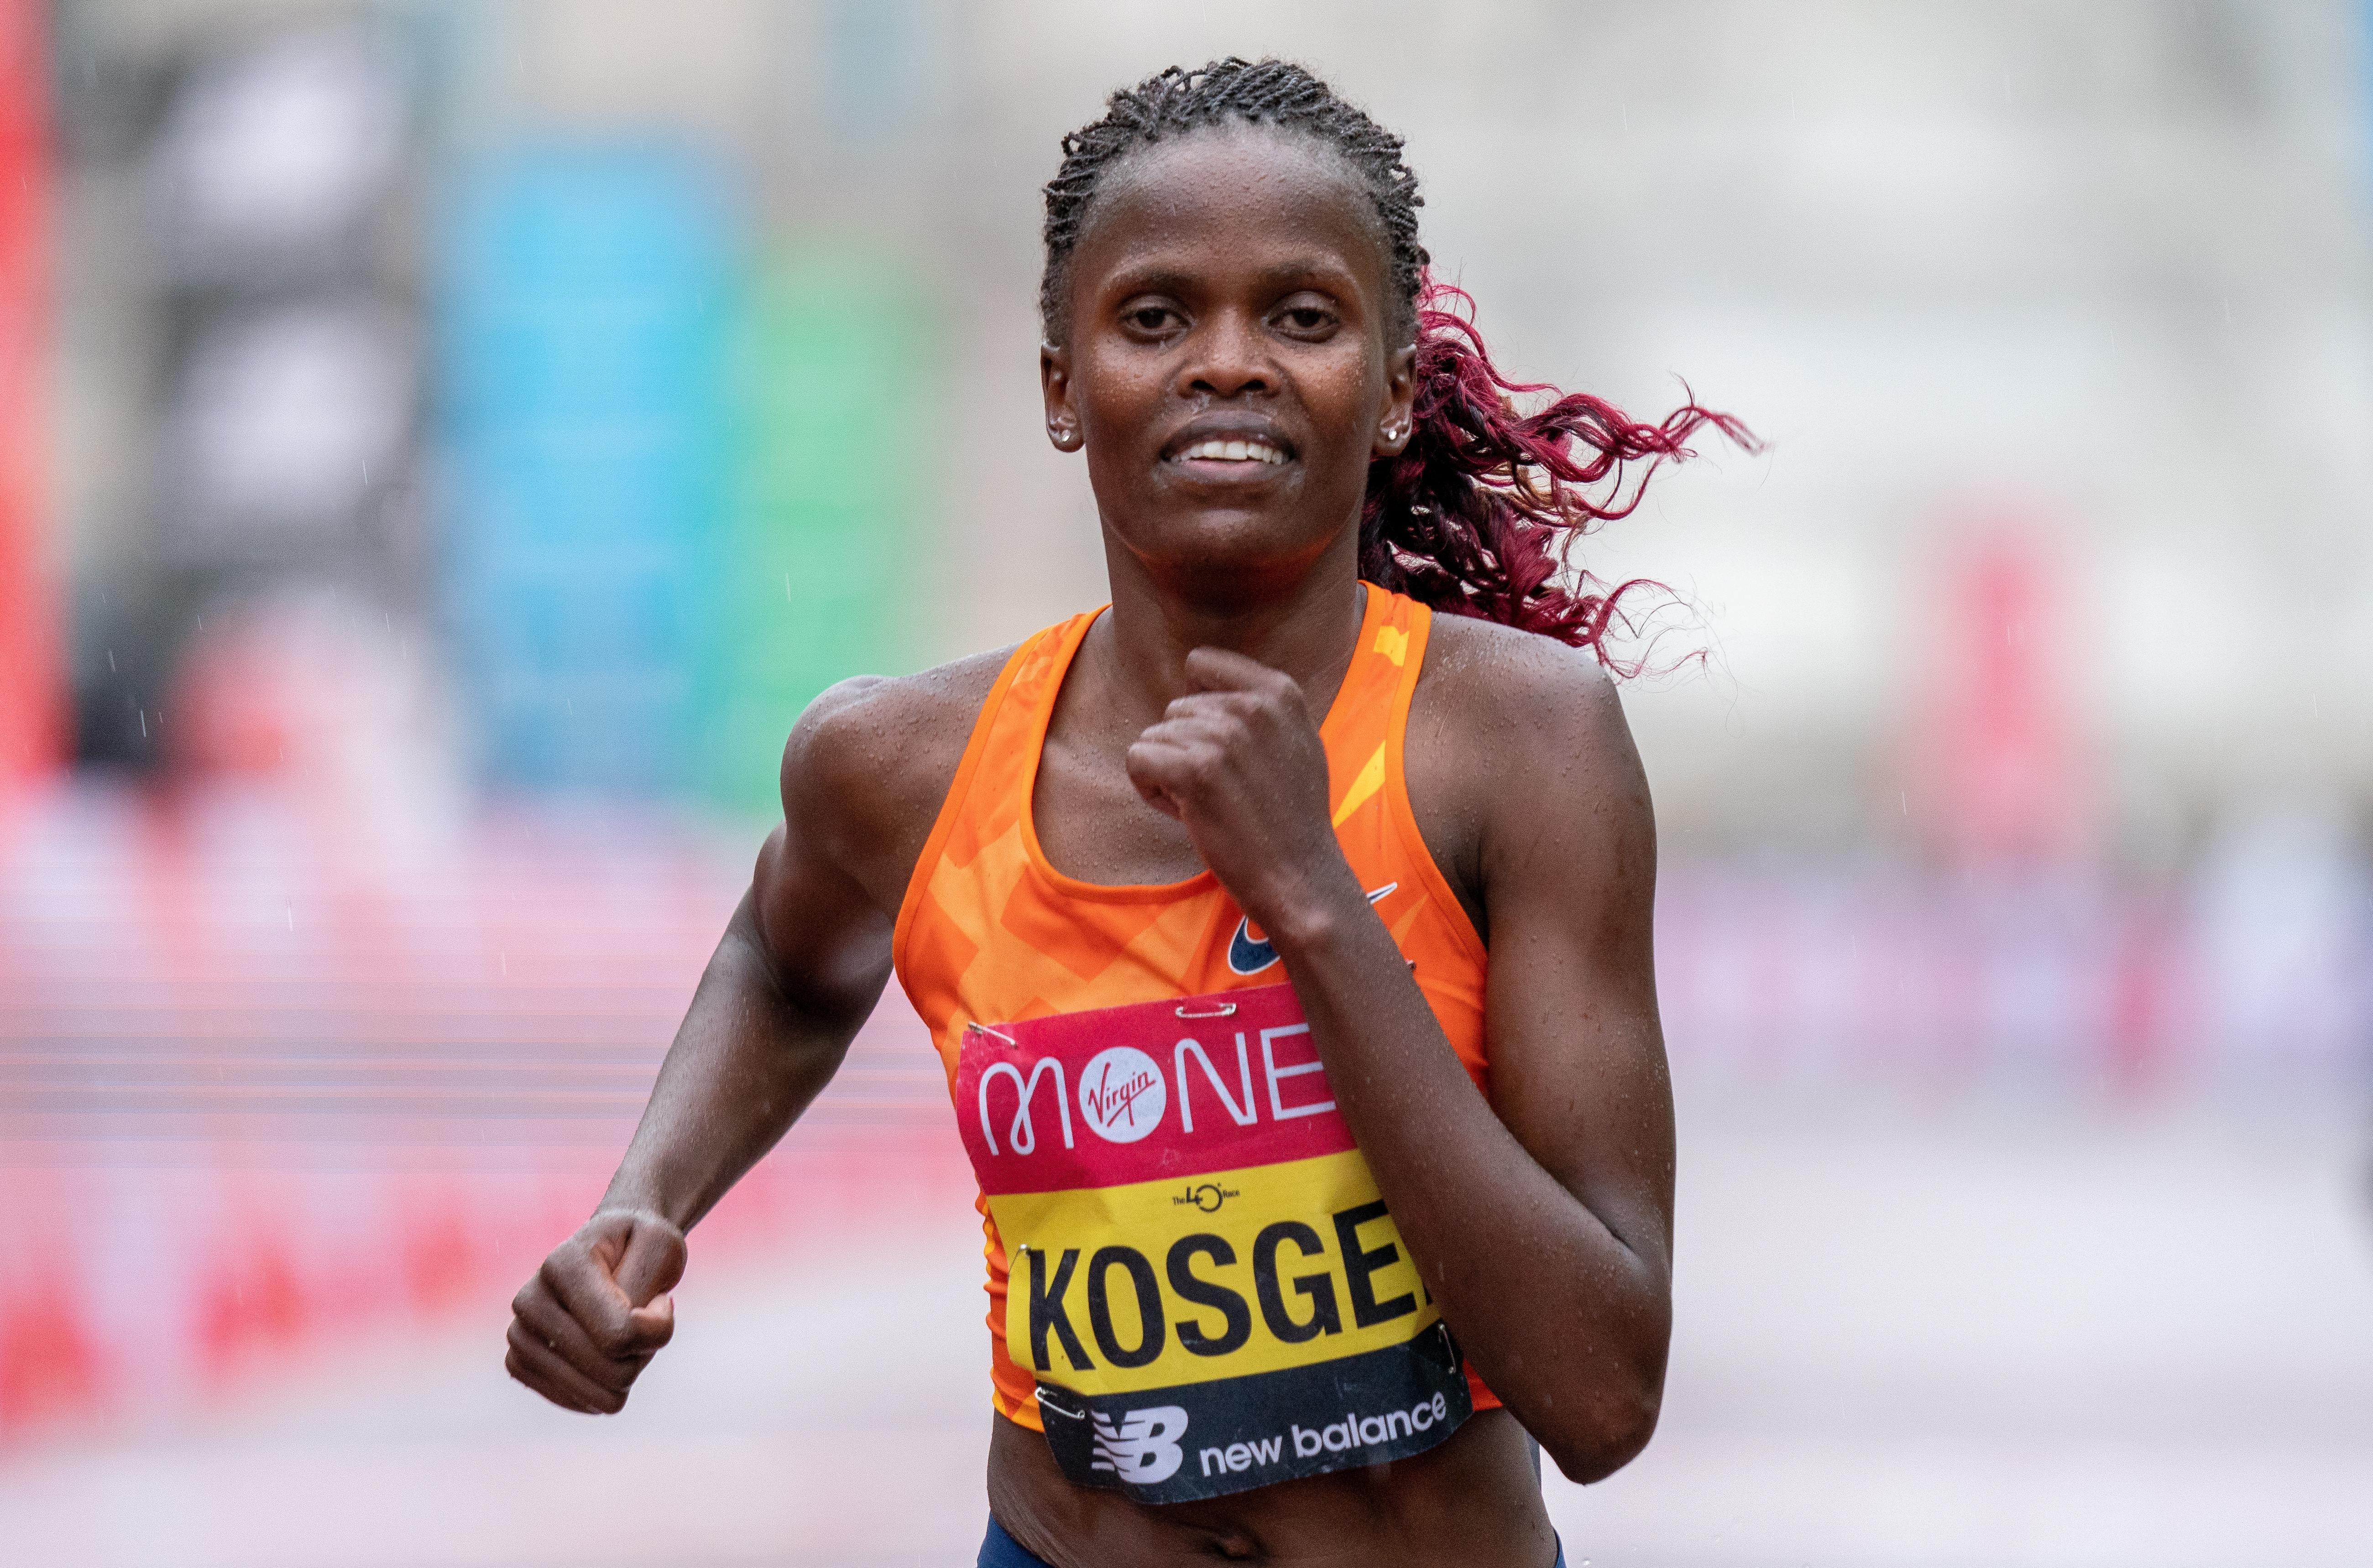 Brigid Kosgei of Kenya competes in the Elite Women's Field during the 2020 Virgin Money London Marathon around St James on October 04, 2020 in London, England.